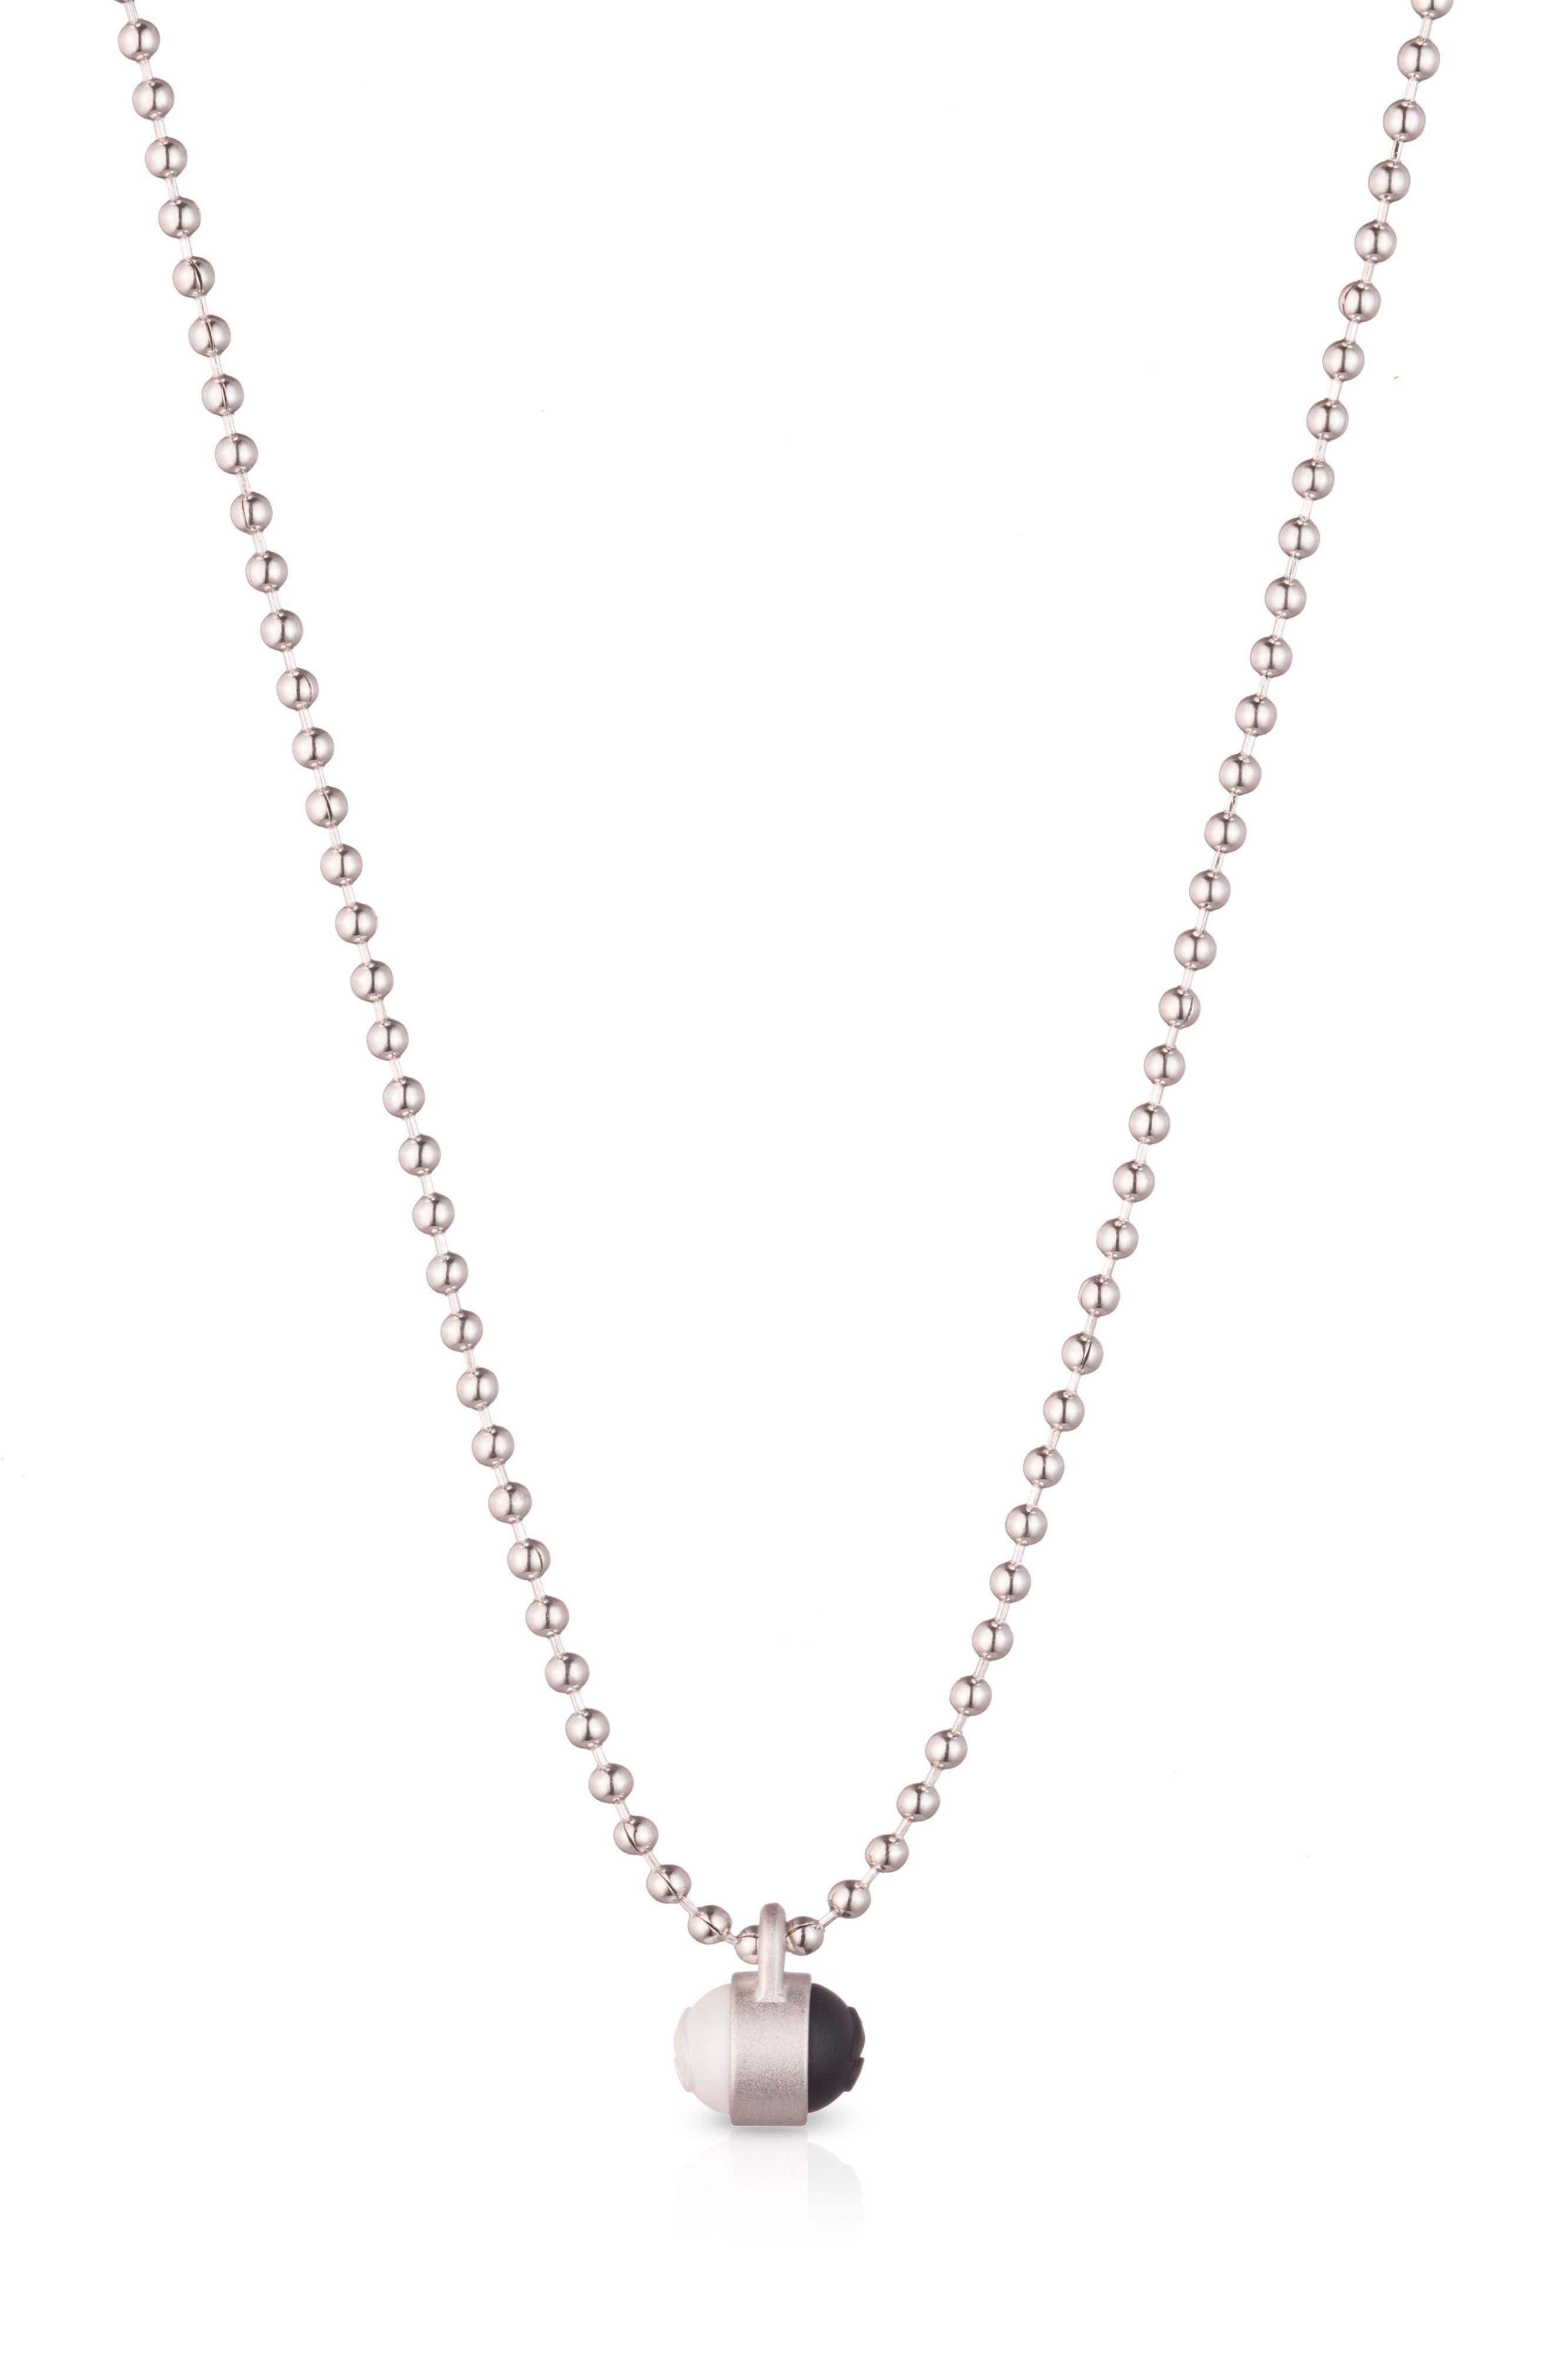 Pendant Ball Chain Necklace,                             Main thumbnail 2, color,